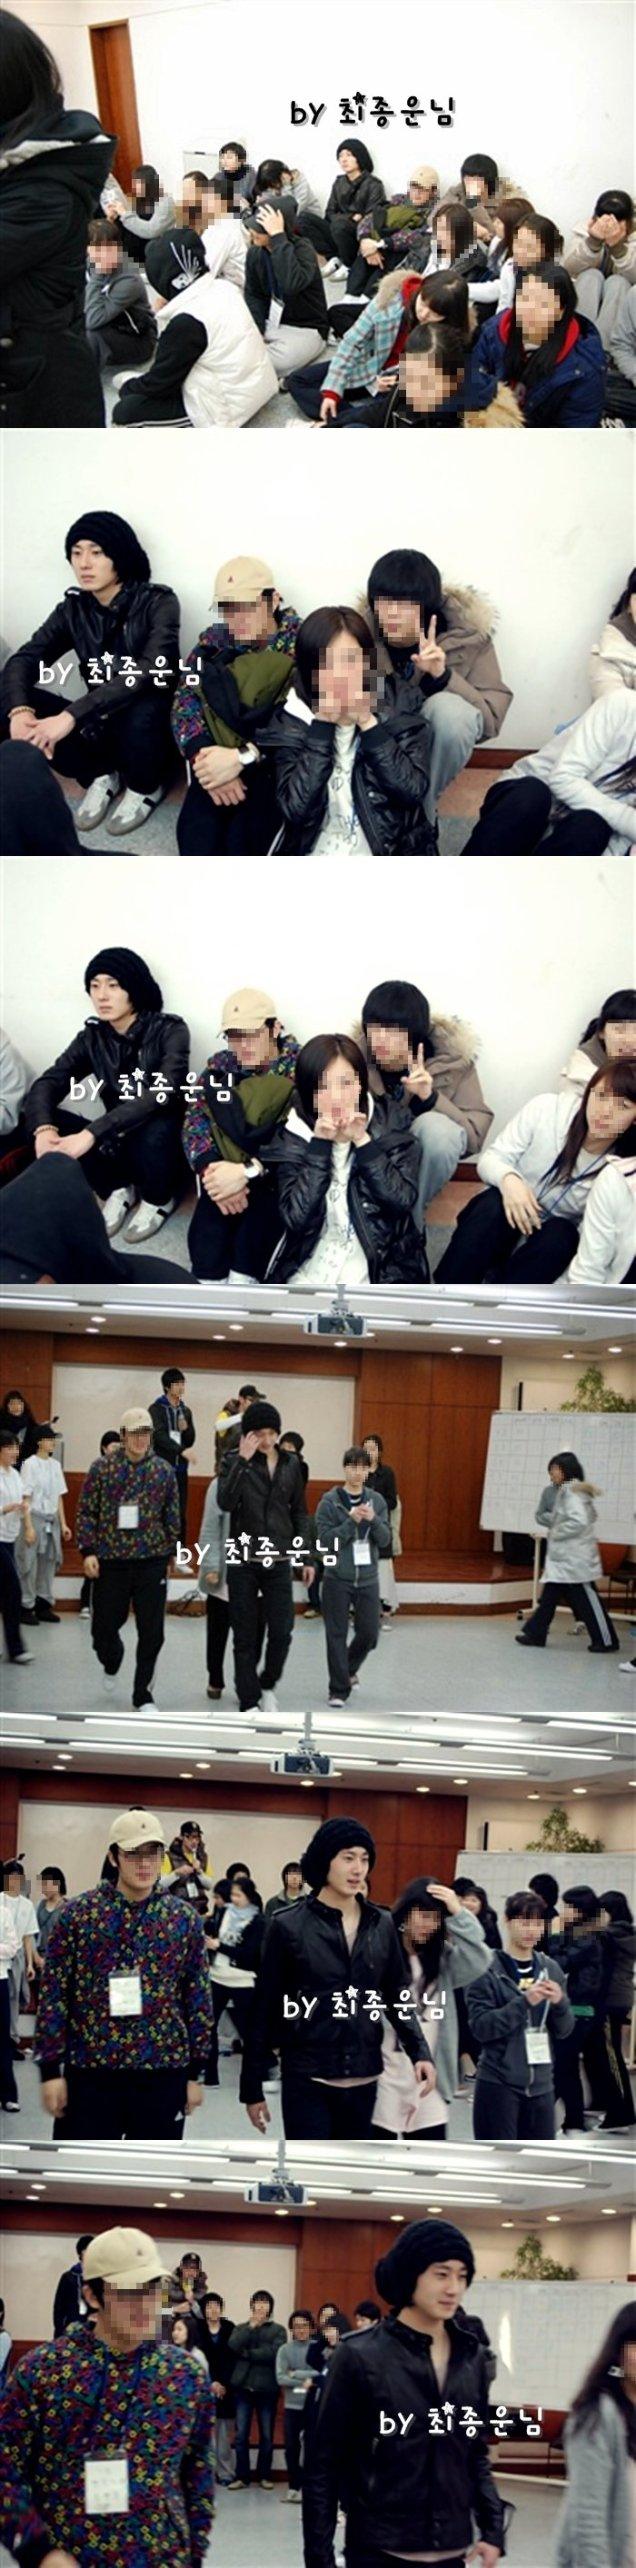 2008 03 JIW Orientation at Hanyang 2